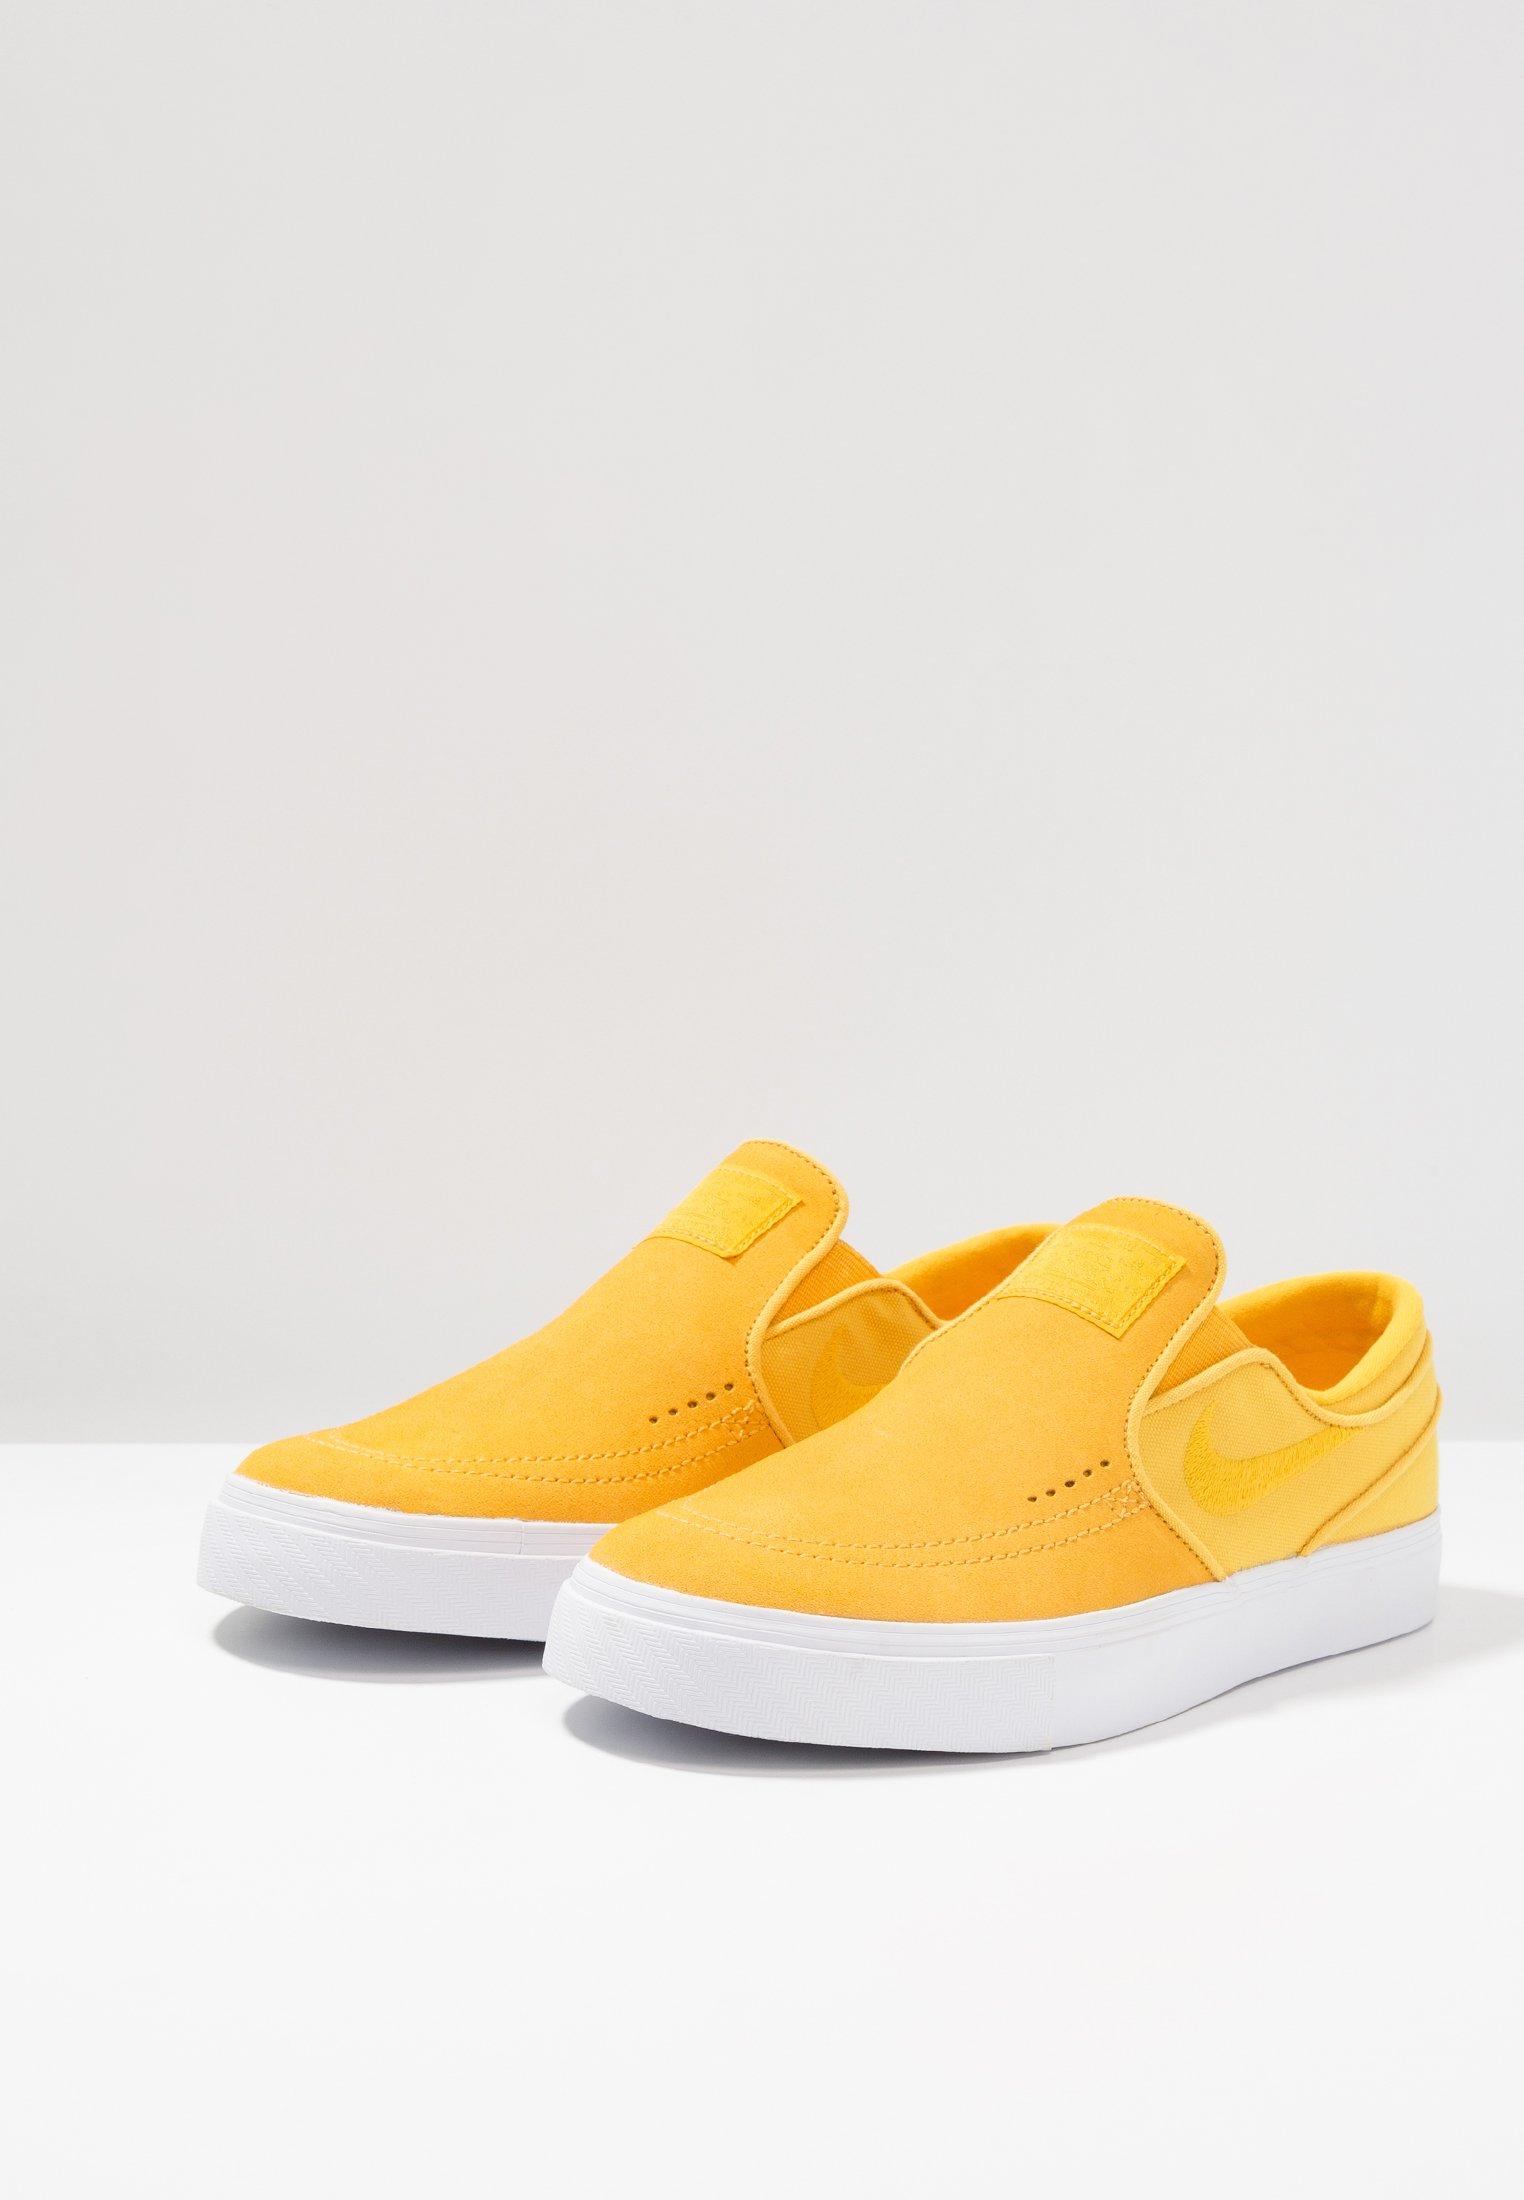 Yellow Zoom Stefan Nike white JanoskiMocassins Sb Ochre Pk80nwONX